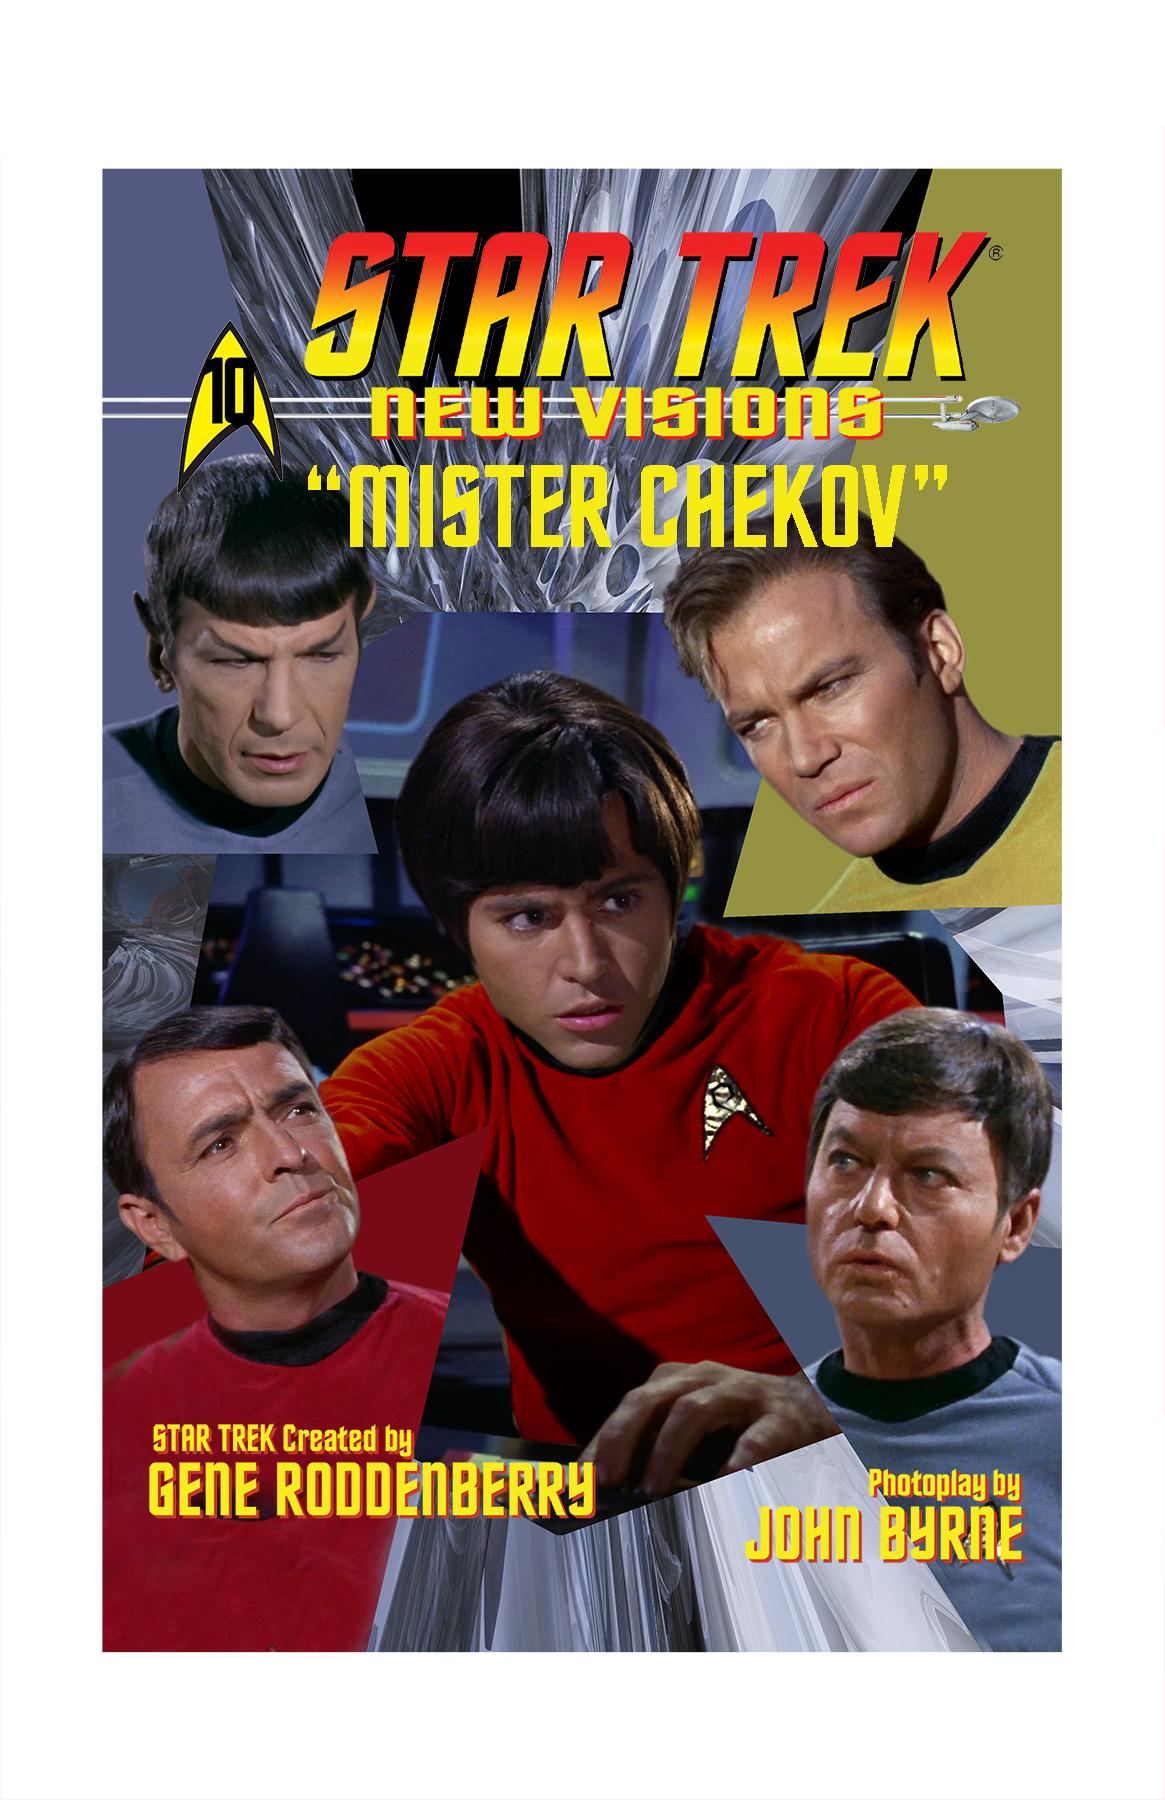 StarTrekCover.10.CHEKOV-FINAL